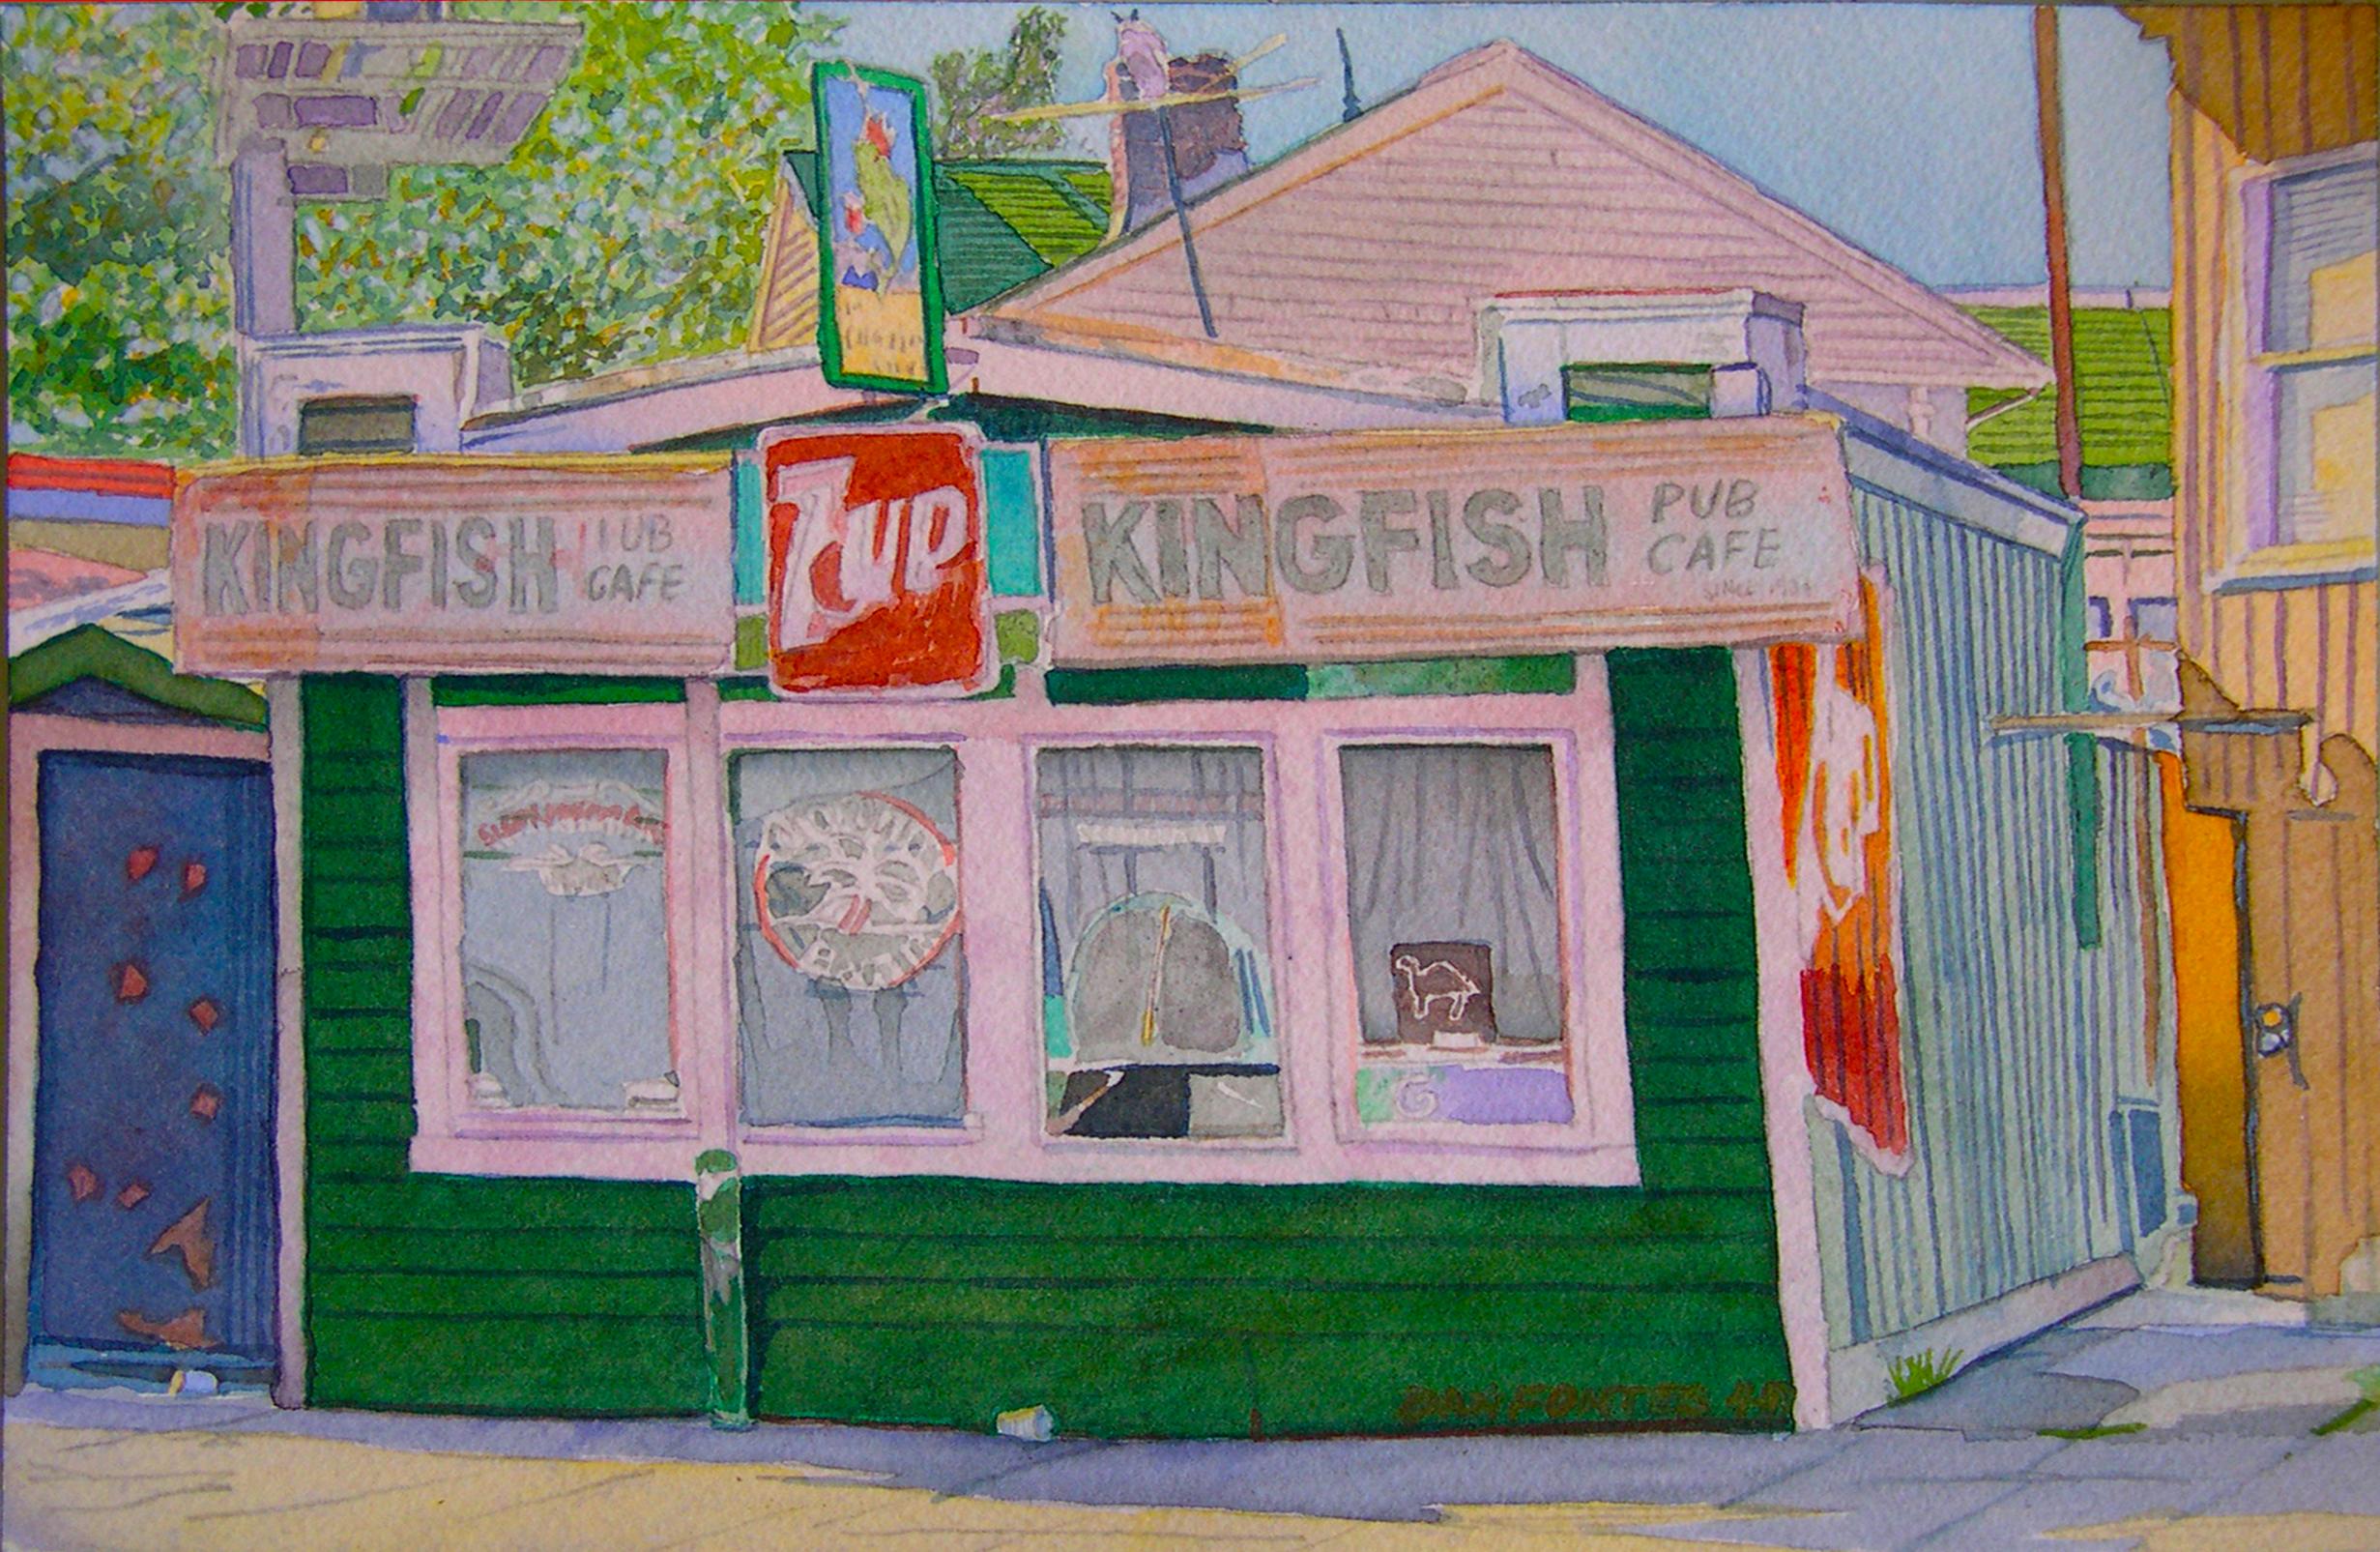 "Title: Kingfish Cafe, Claremont near Telegraph, Oakland 2007    Media: Watercolors    Dimensions: 8"" x 11""    Collection of: Kristina Peterson, El Cerrito"